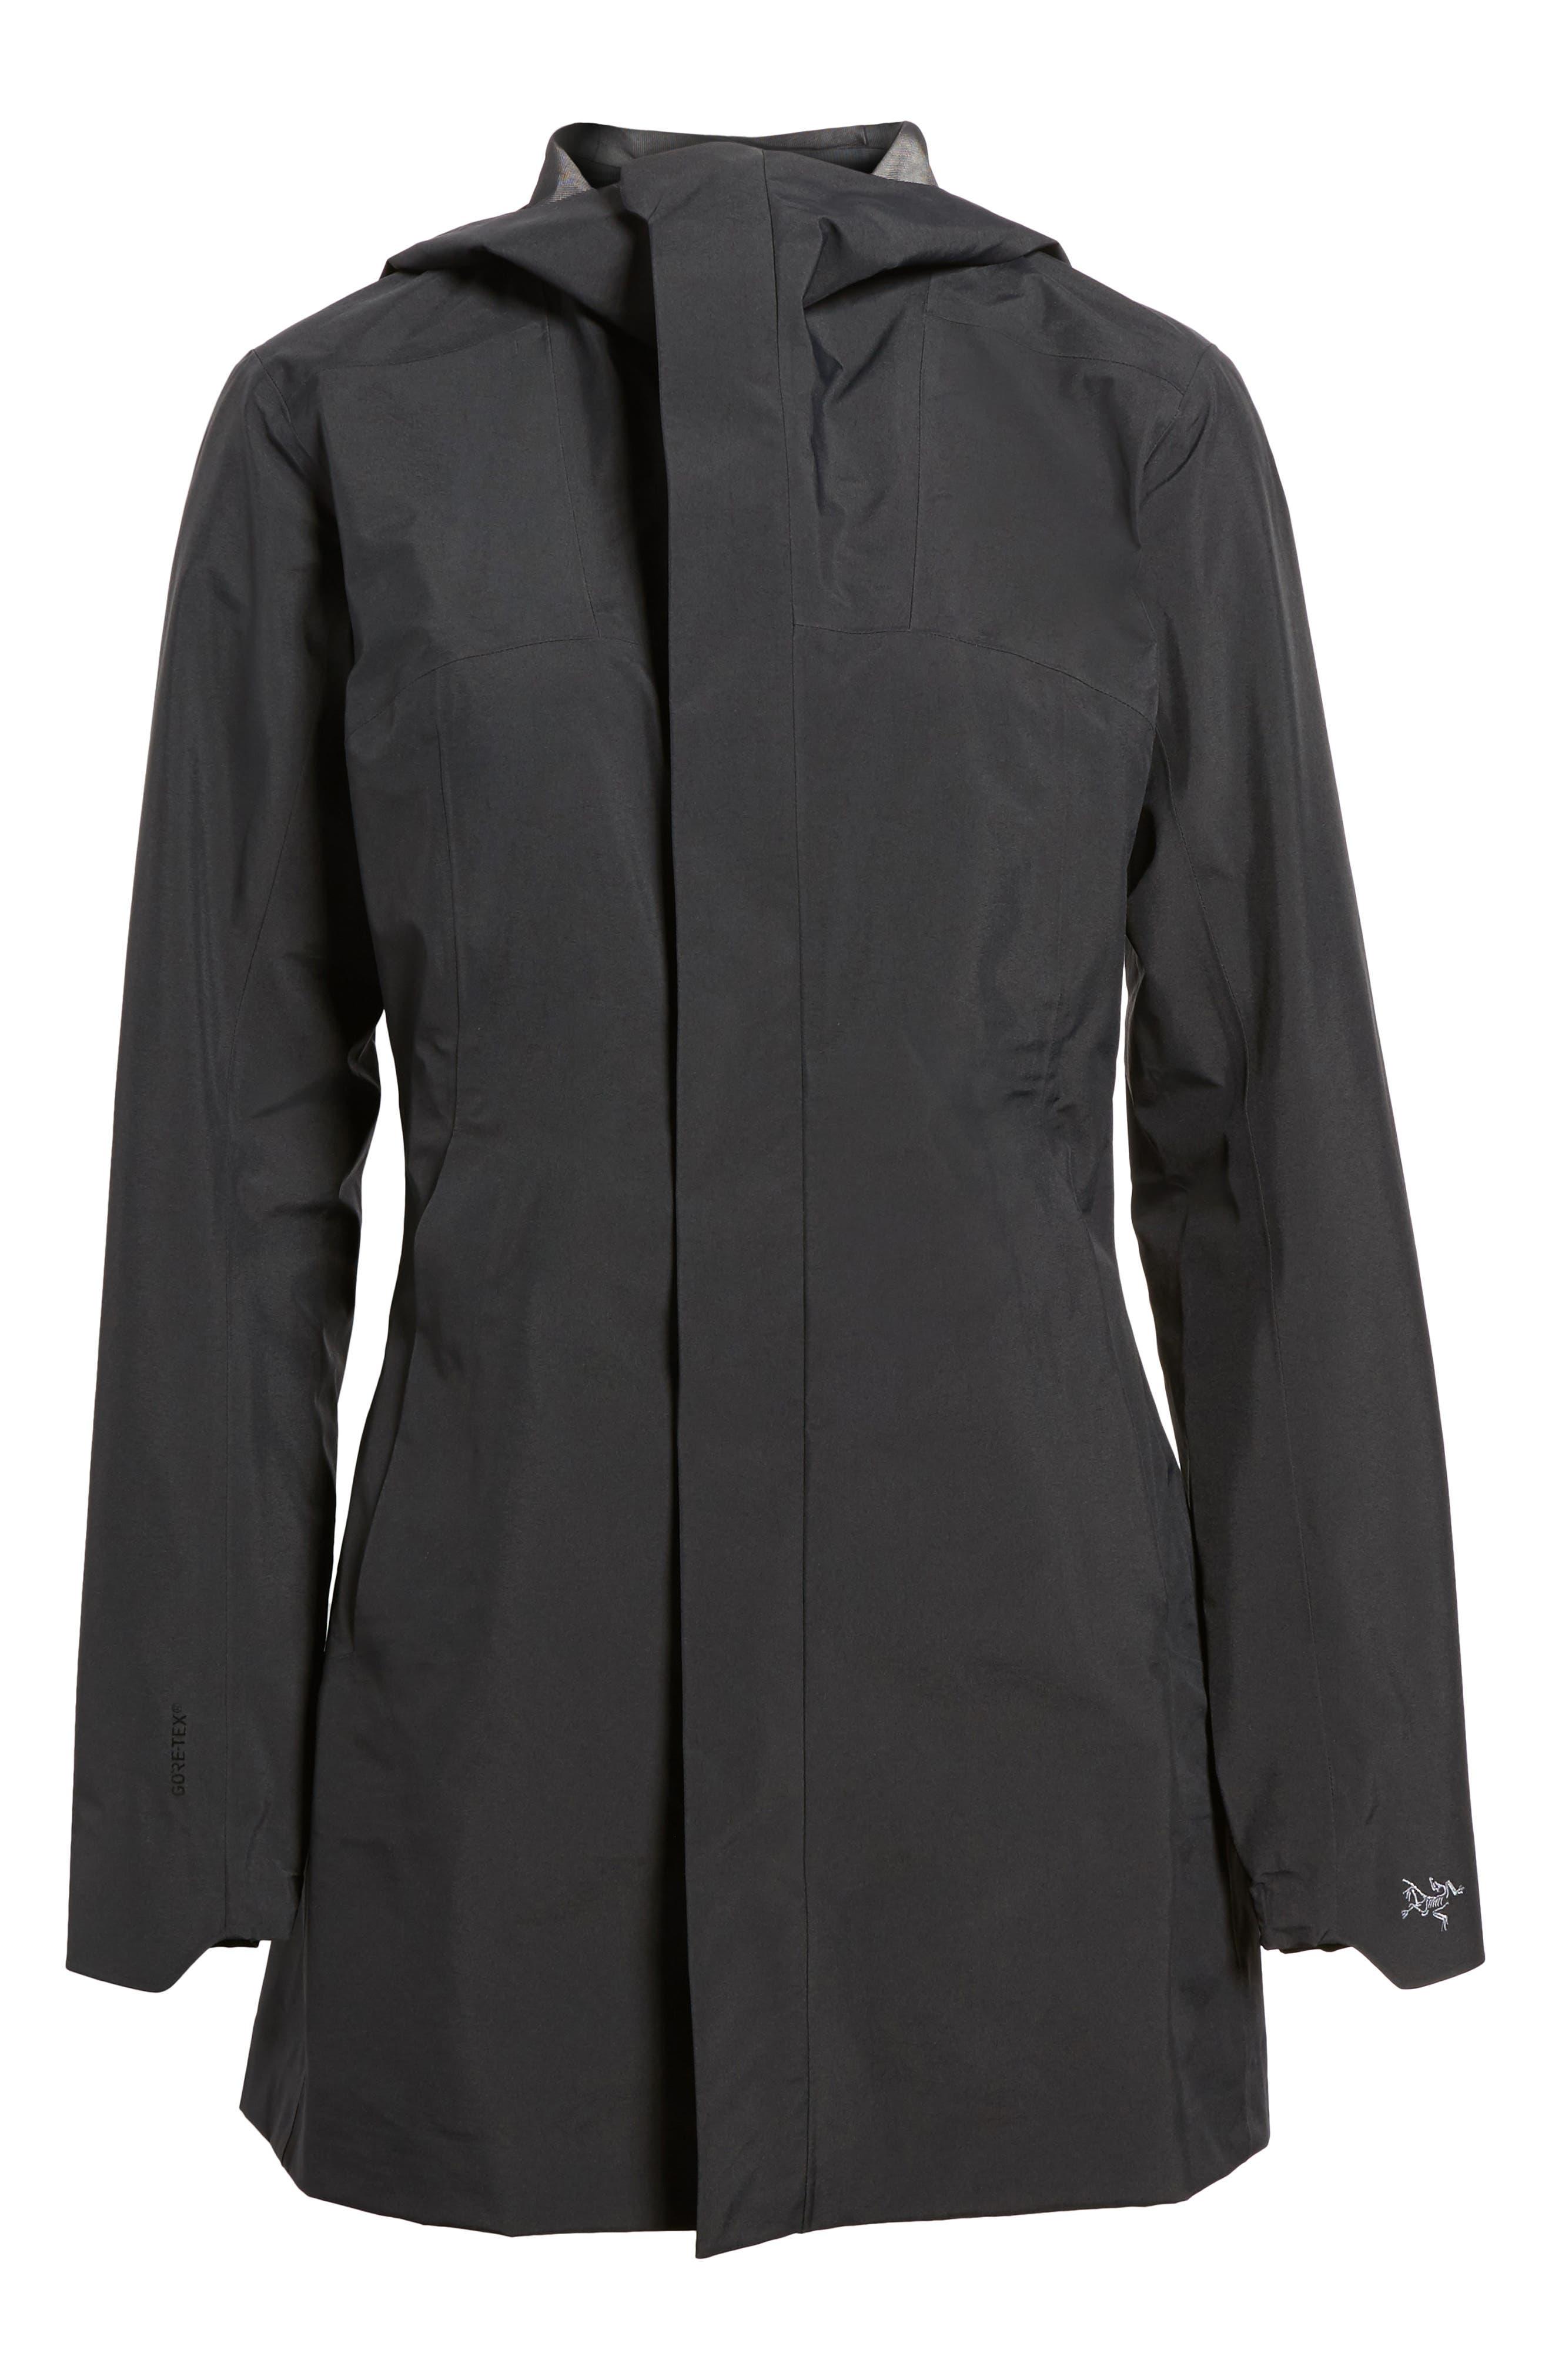 Codetta Waterproof Relaxed Fit Gore-Tex<sup>®</sup> 3L Rain Jacket,                             Main thumbnail 1, color,                             Black